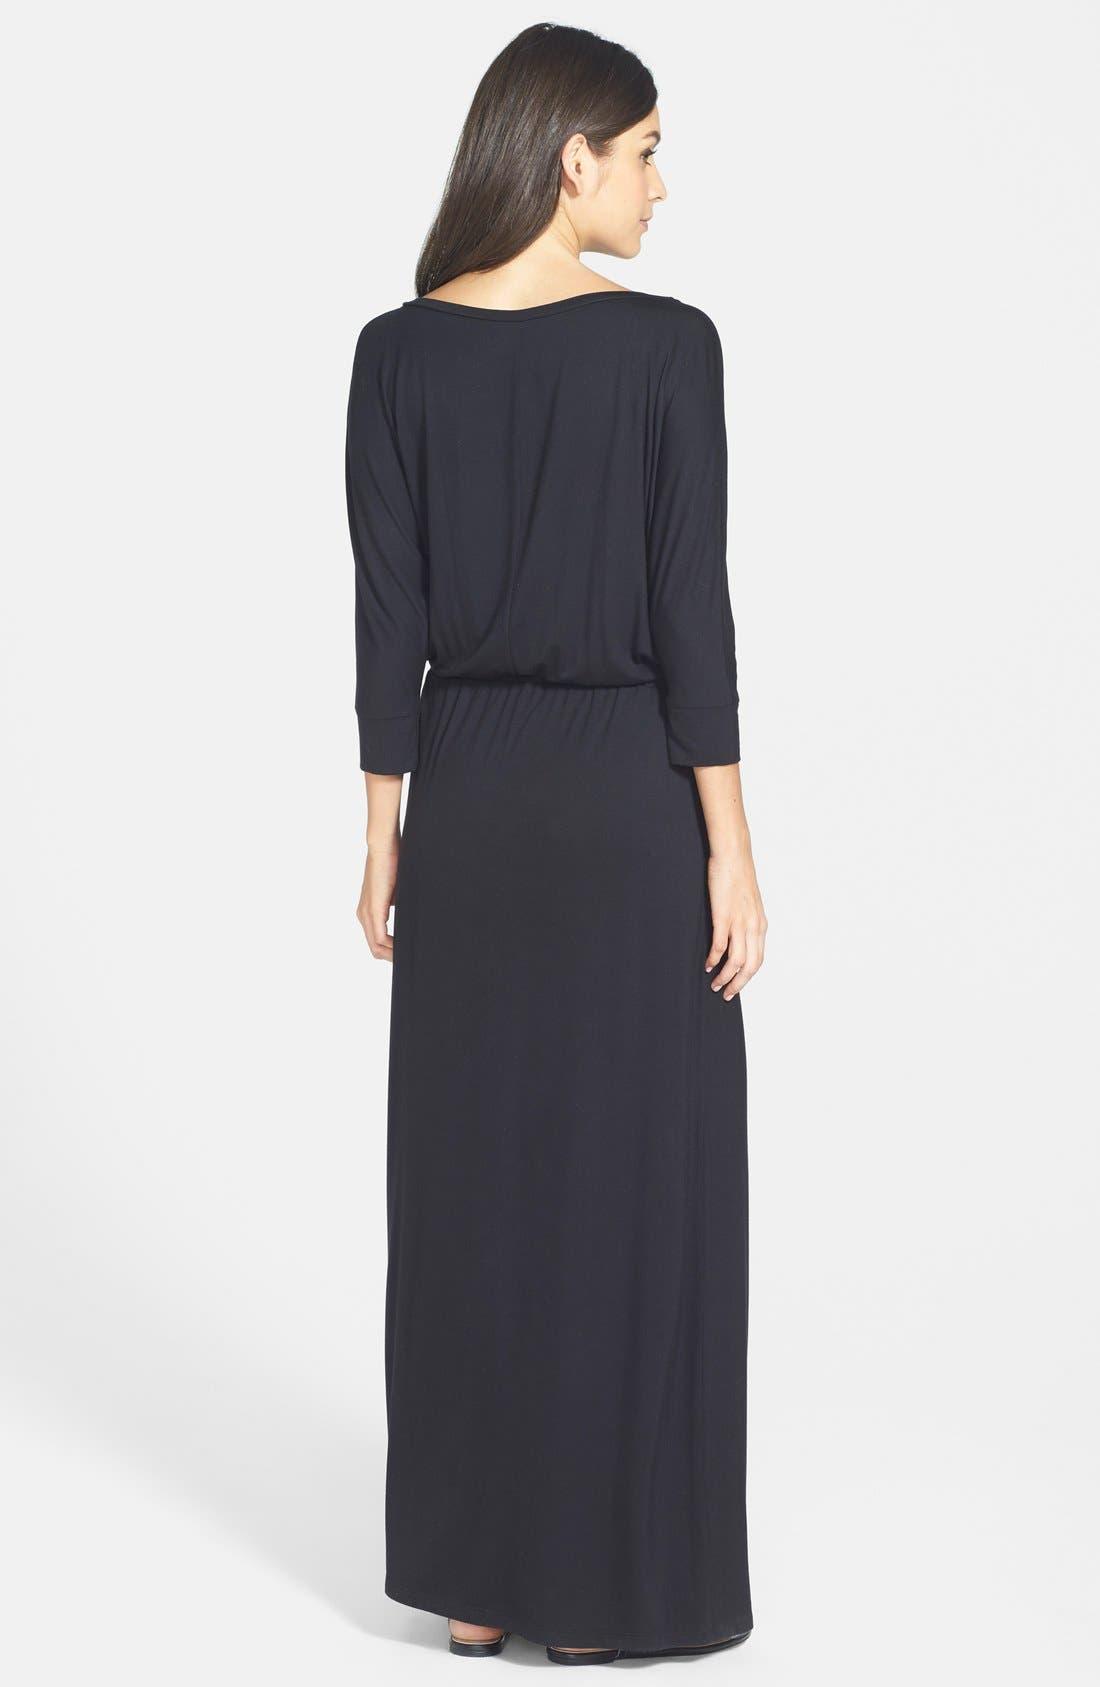 Dolman Sleeve Maxi Dress,                             Alternate thumbnail 3, color,                             001